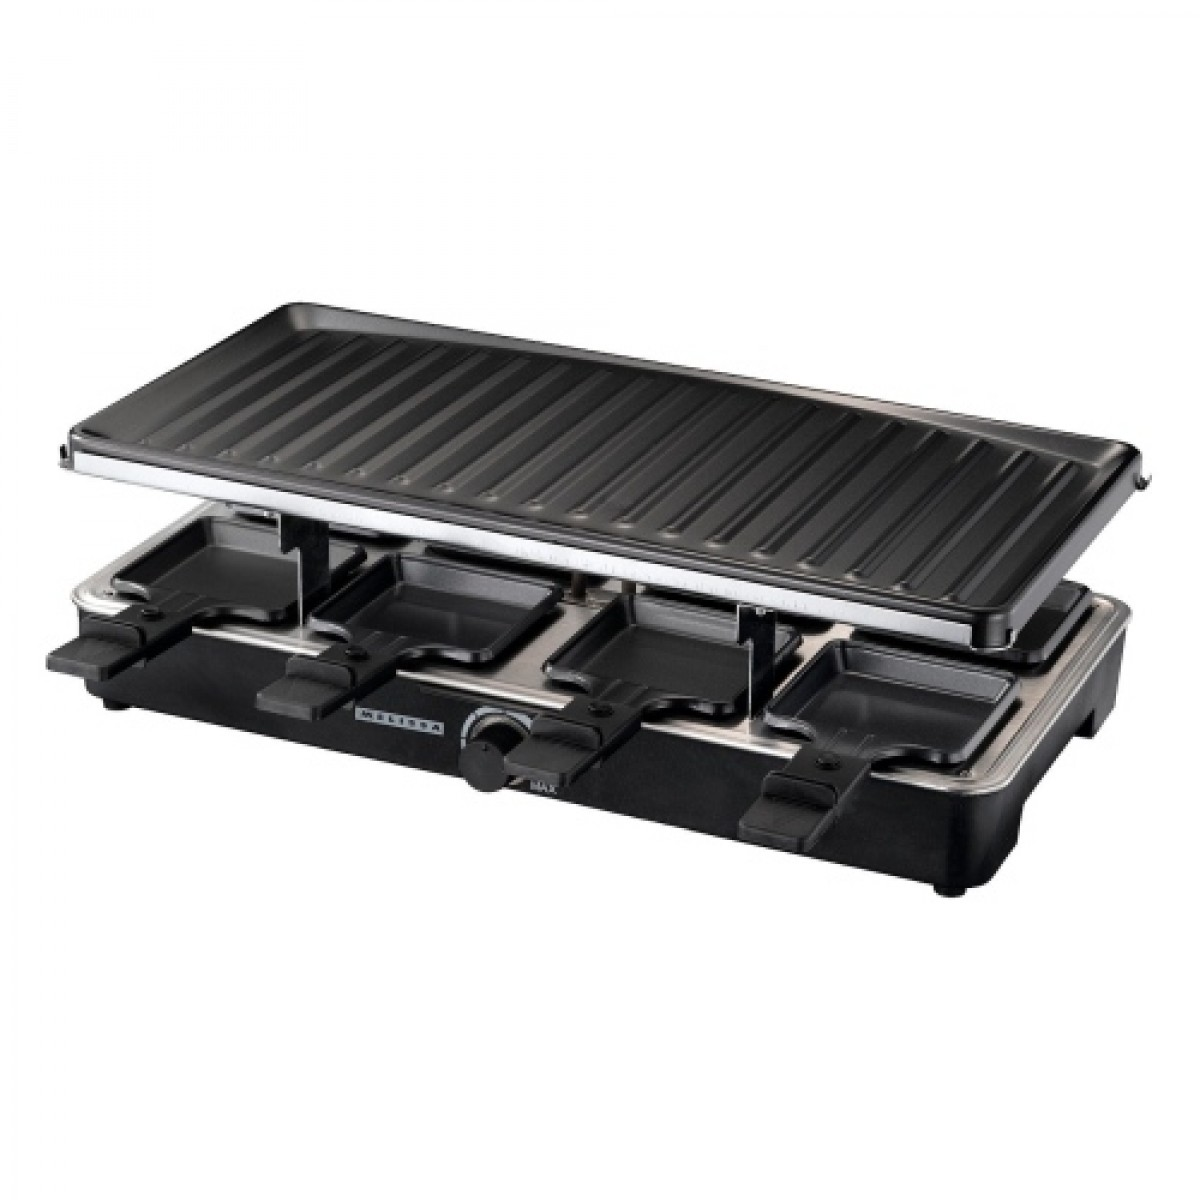 MELISSA Raclette 8 personer 1200 Watt